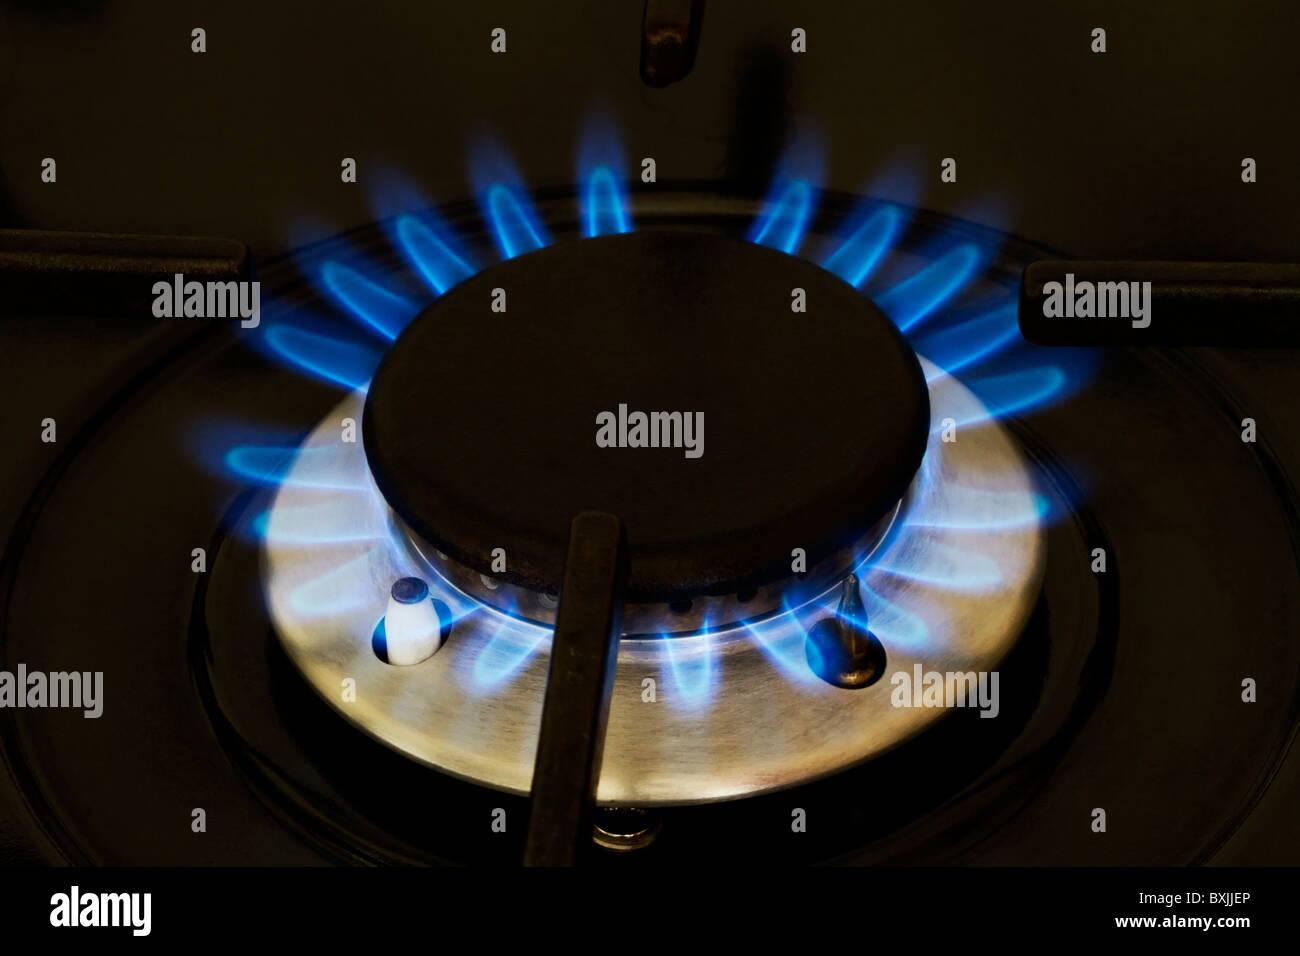 Working gas ring - Stock Image